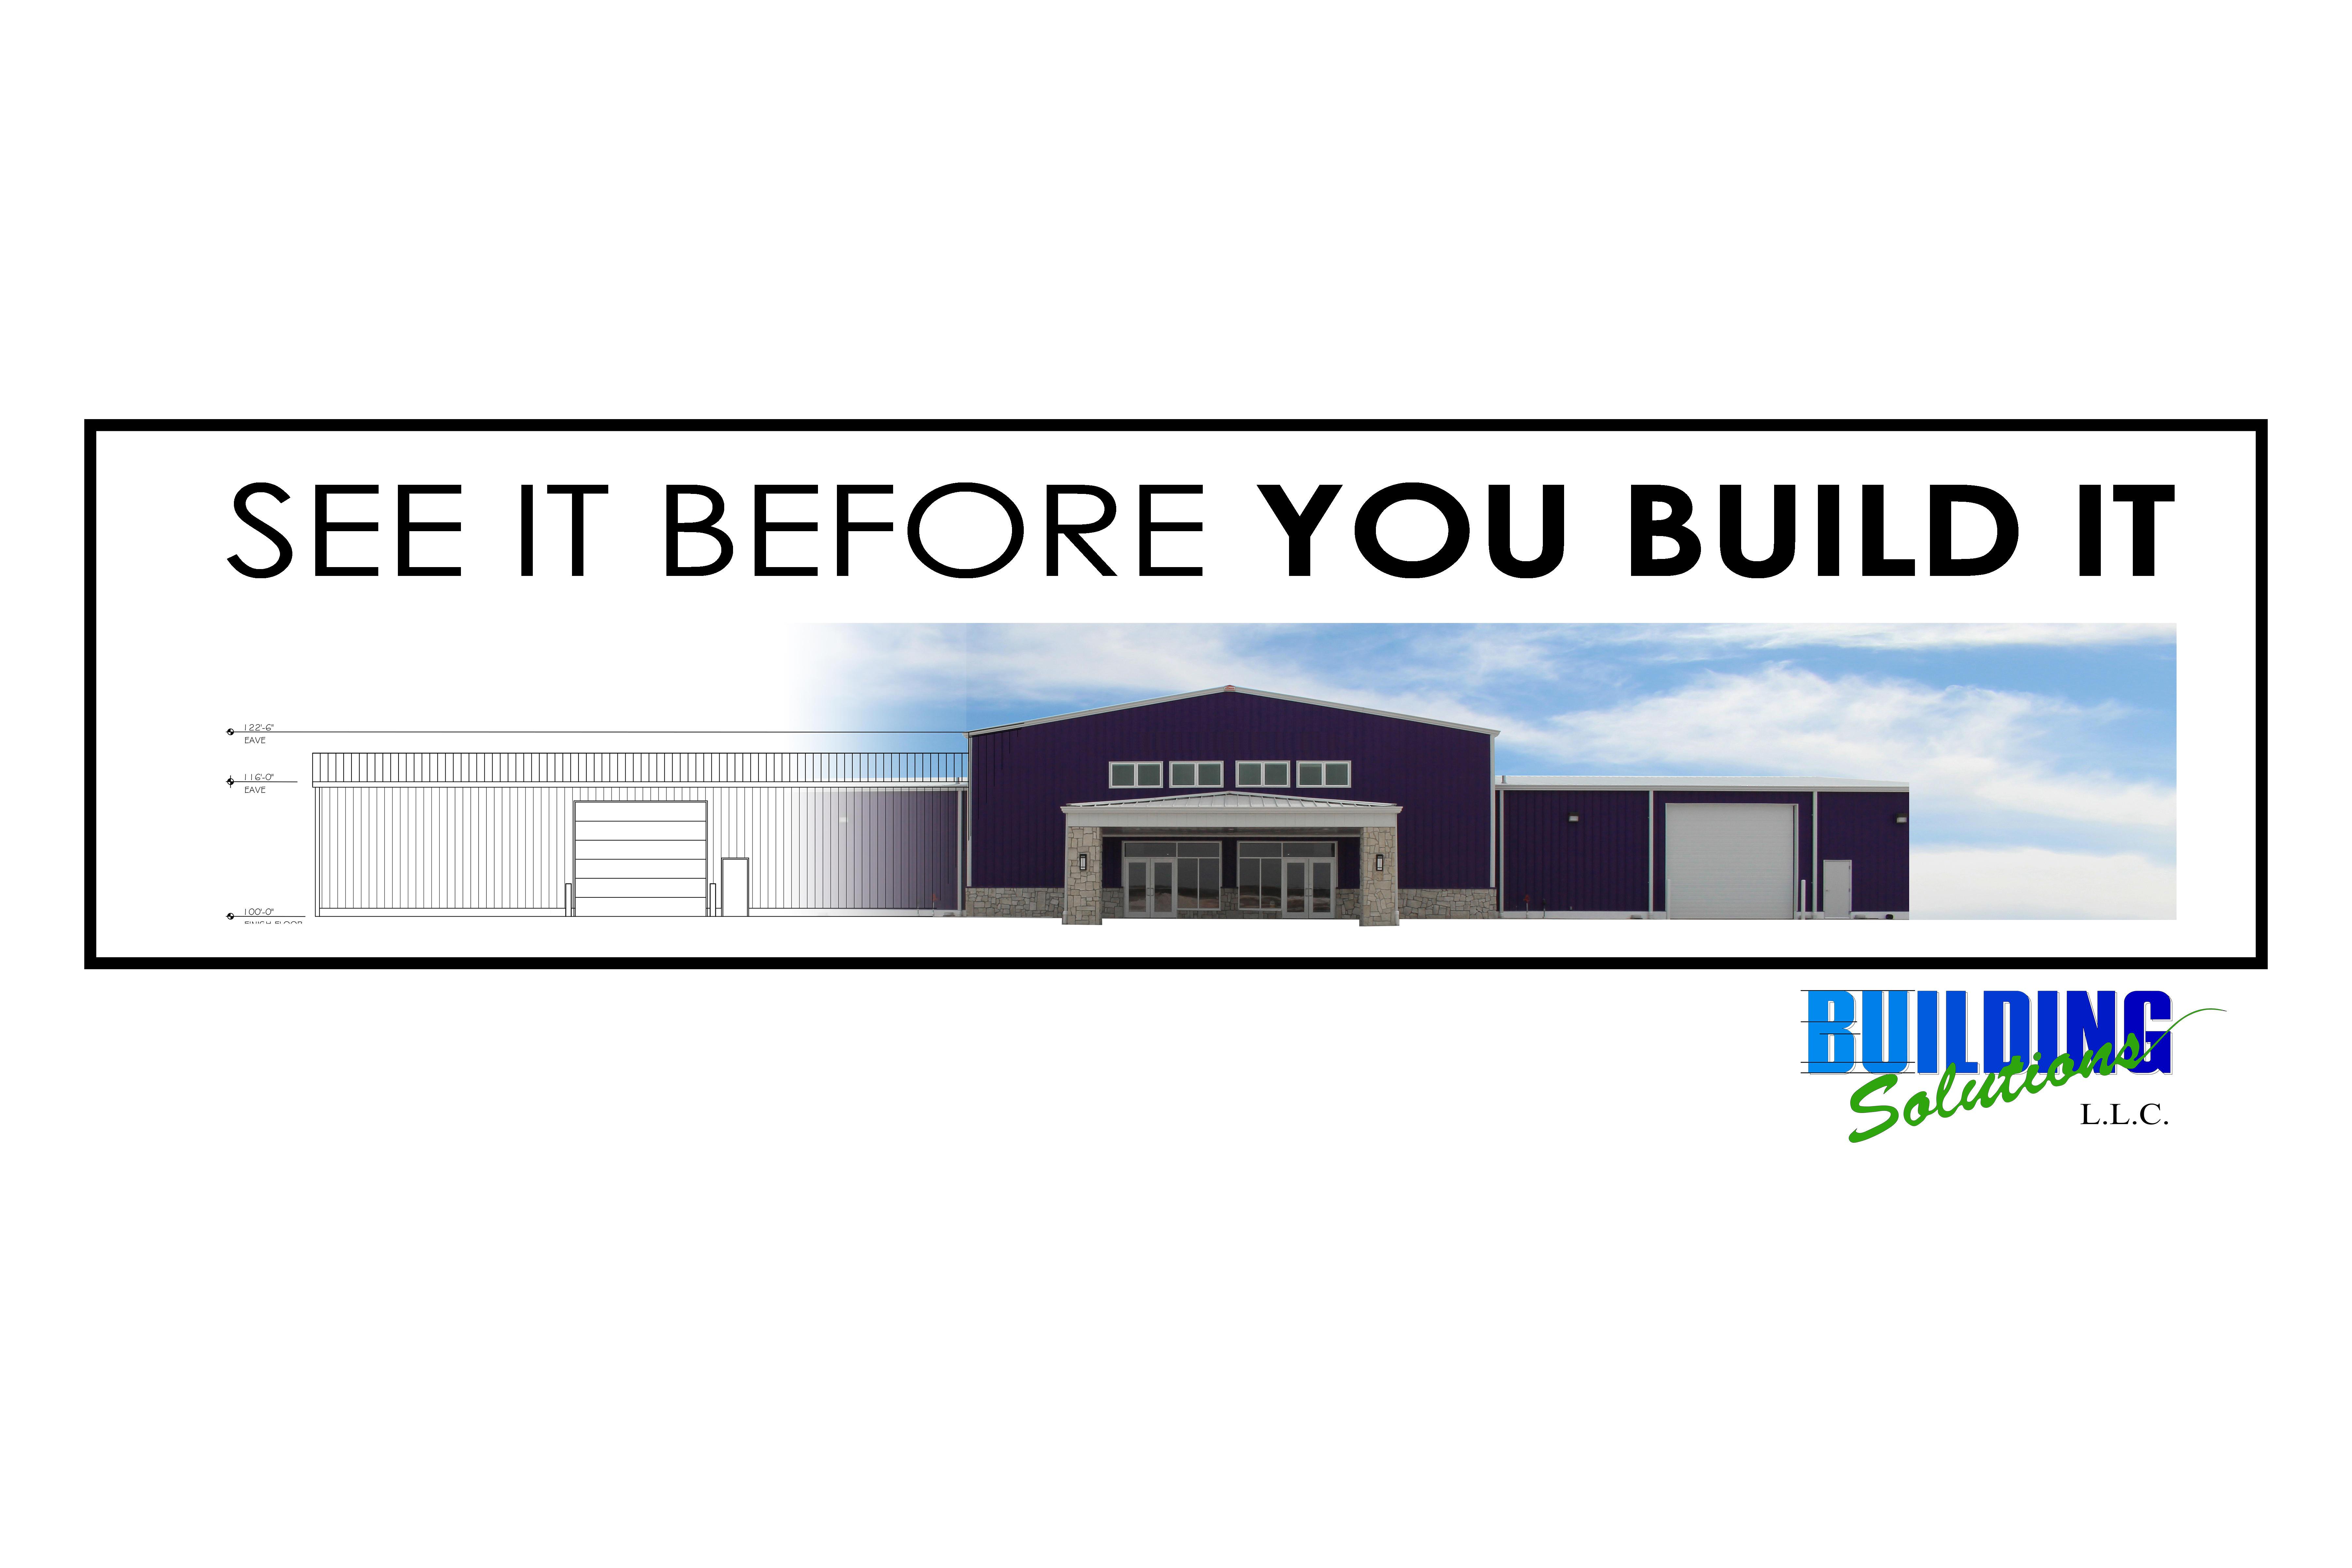 Building Solutions, LLC image 3